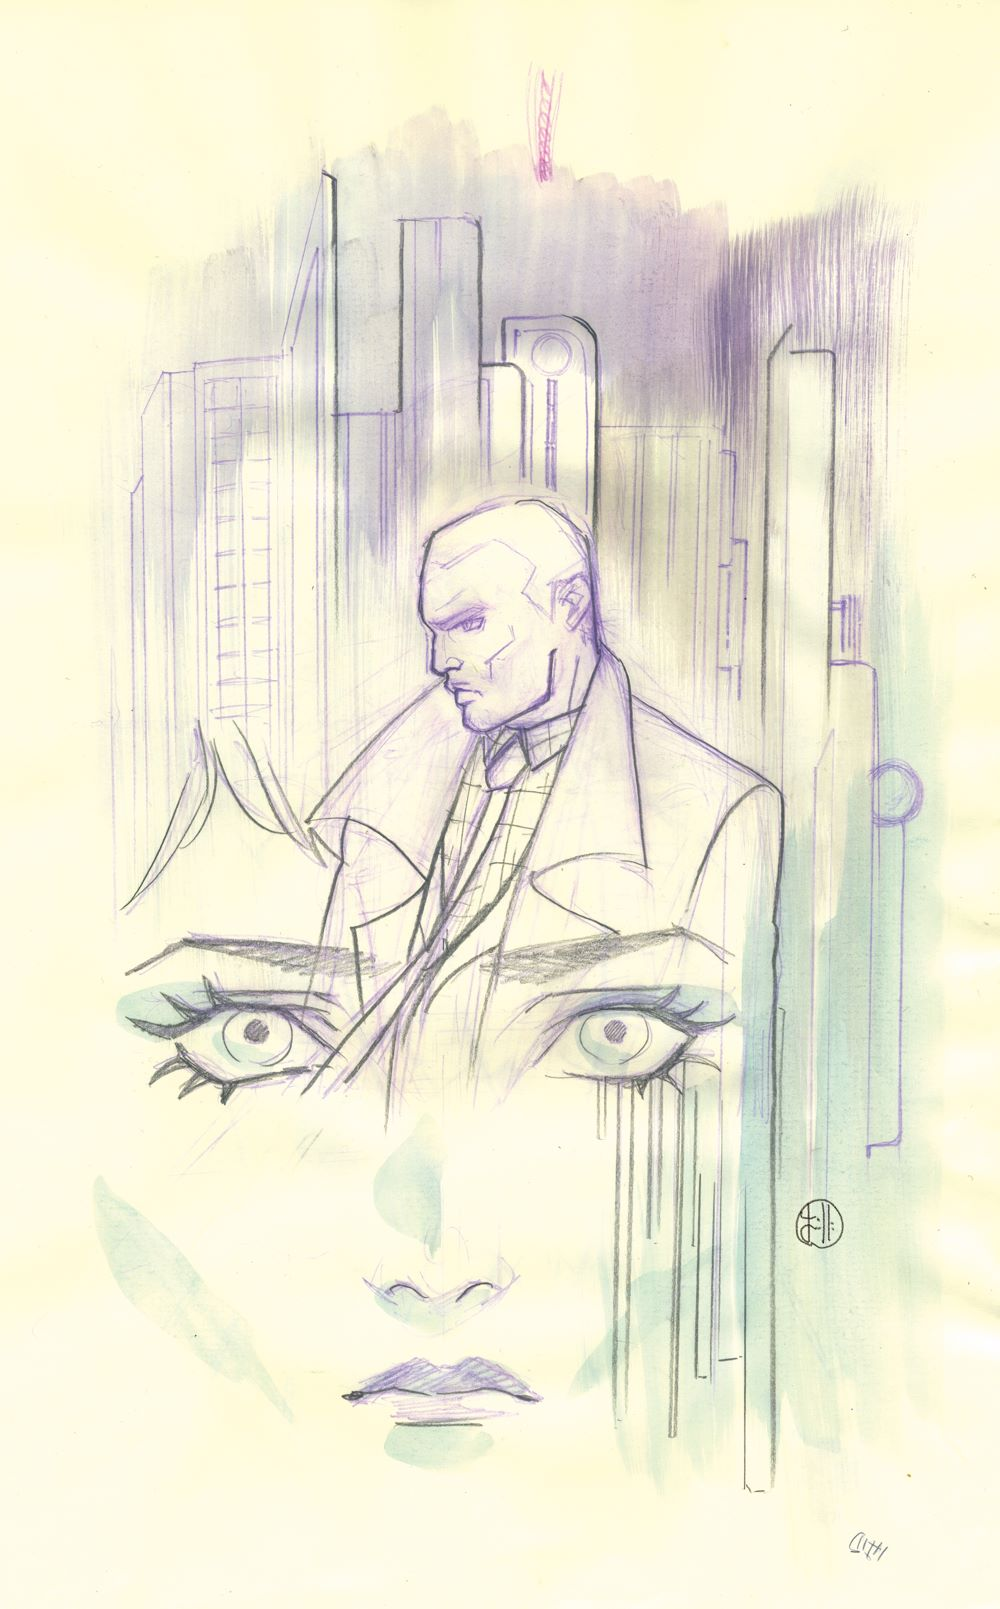 Blade-Runner-Origins_1_G_FOC-MOMOKO-VAR ComicList Previews: BLADE RUNNER ORIGINS #1